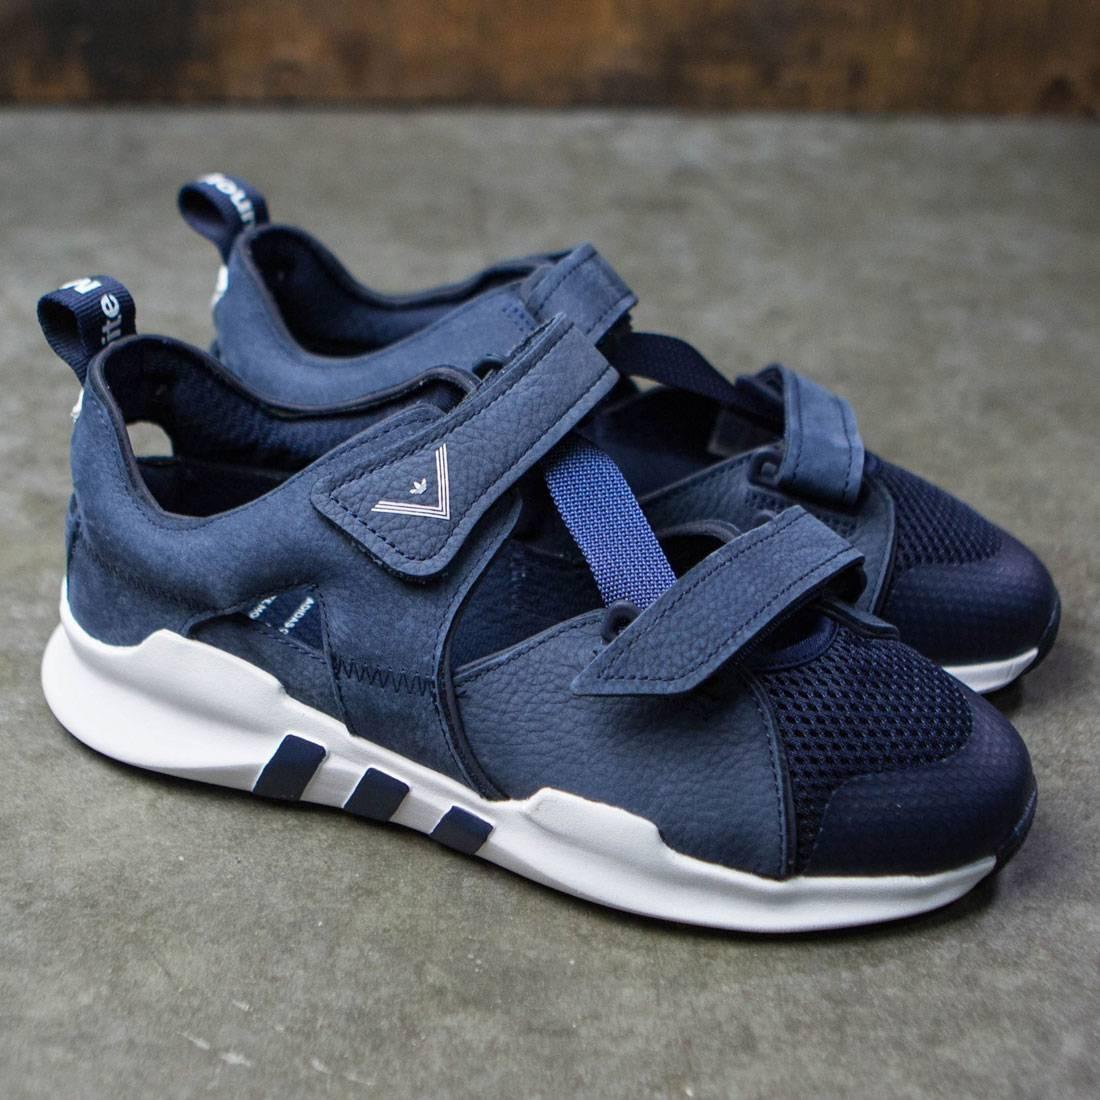 White Mountaineering Adidas ADV Sandal - Navy buy cheap fashion Style great deals sale online IEKNhHkKk